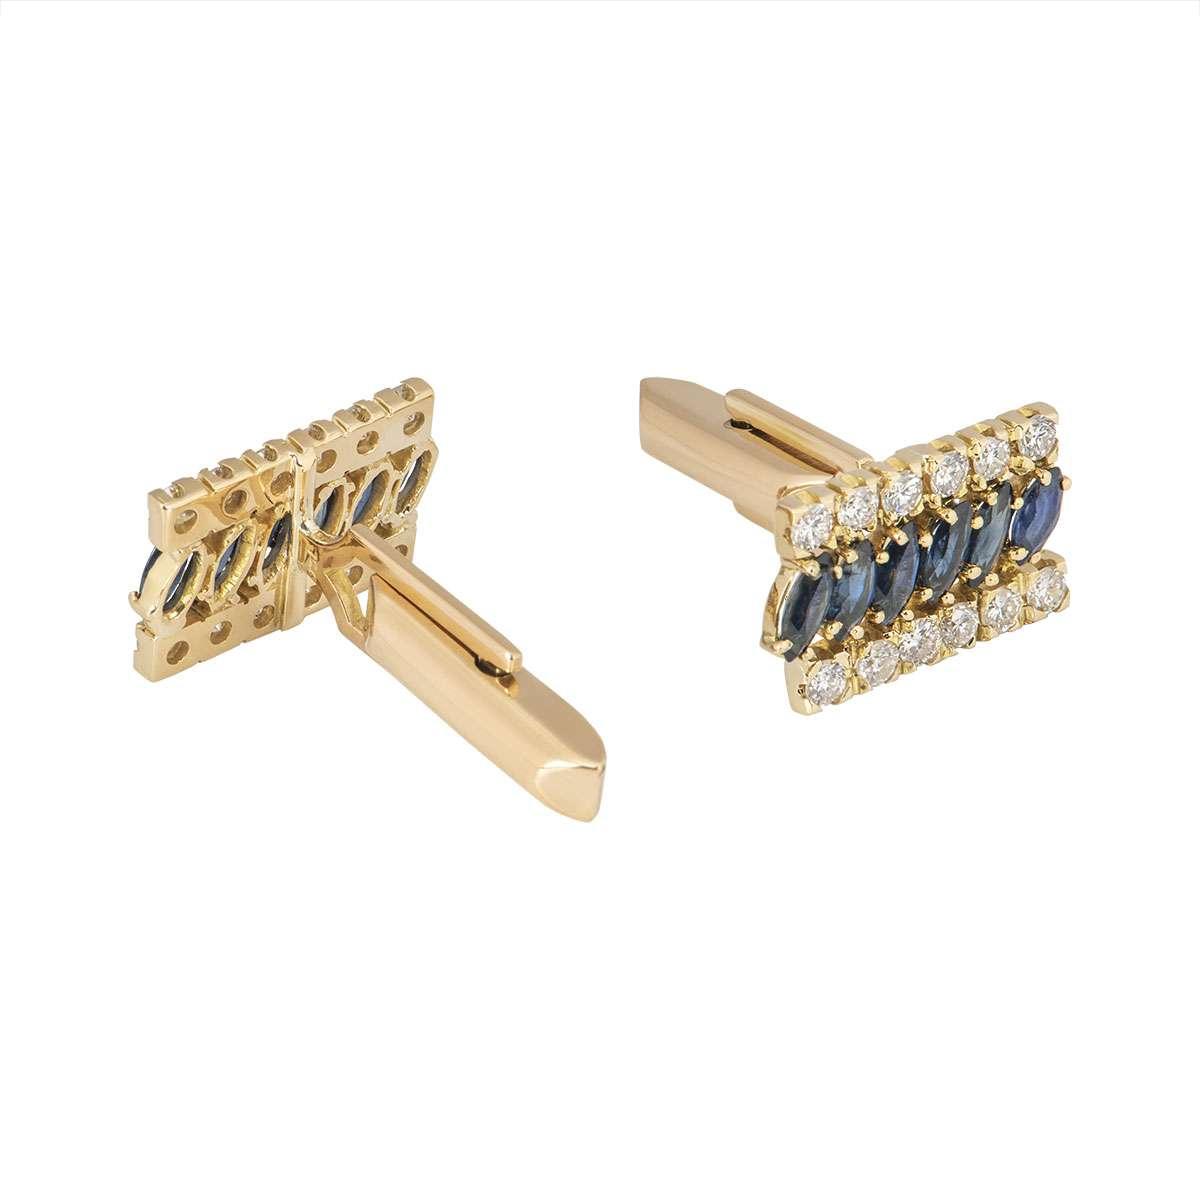 Yellow Gold Diamond And Sapphire Cufflinks